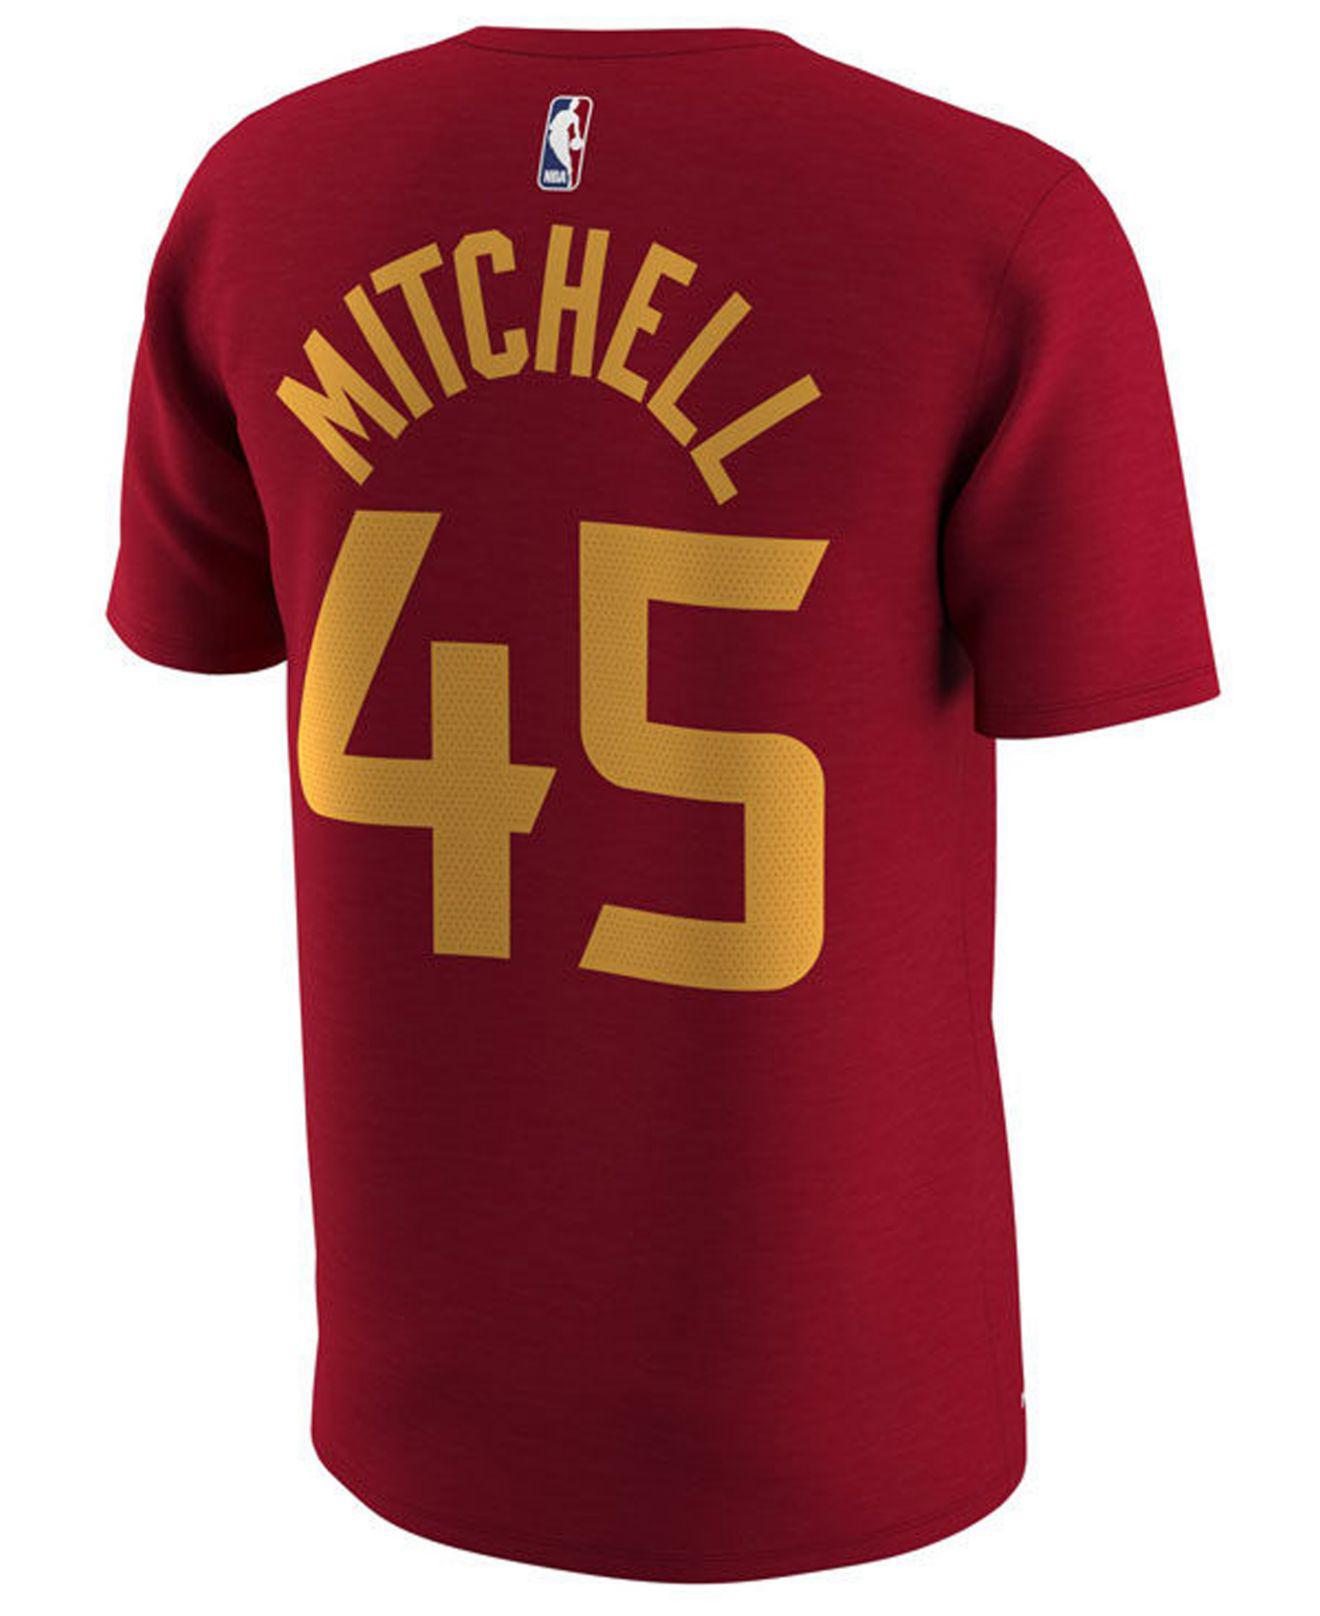 145f30c2c Nike Donovan Mitchell Utah Jazz City Player T-shirt in Red for Men ...